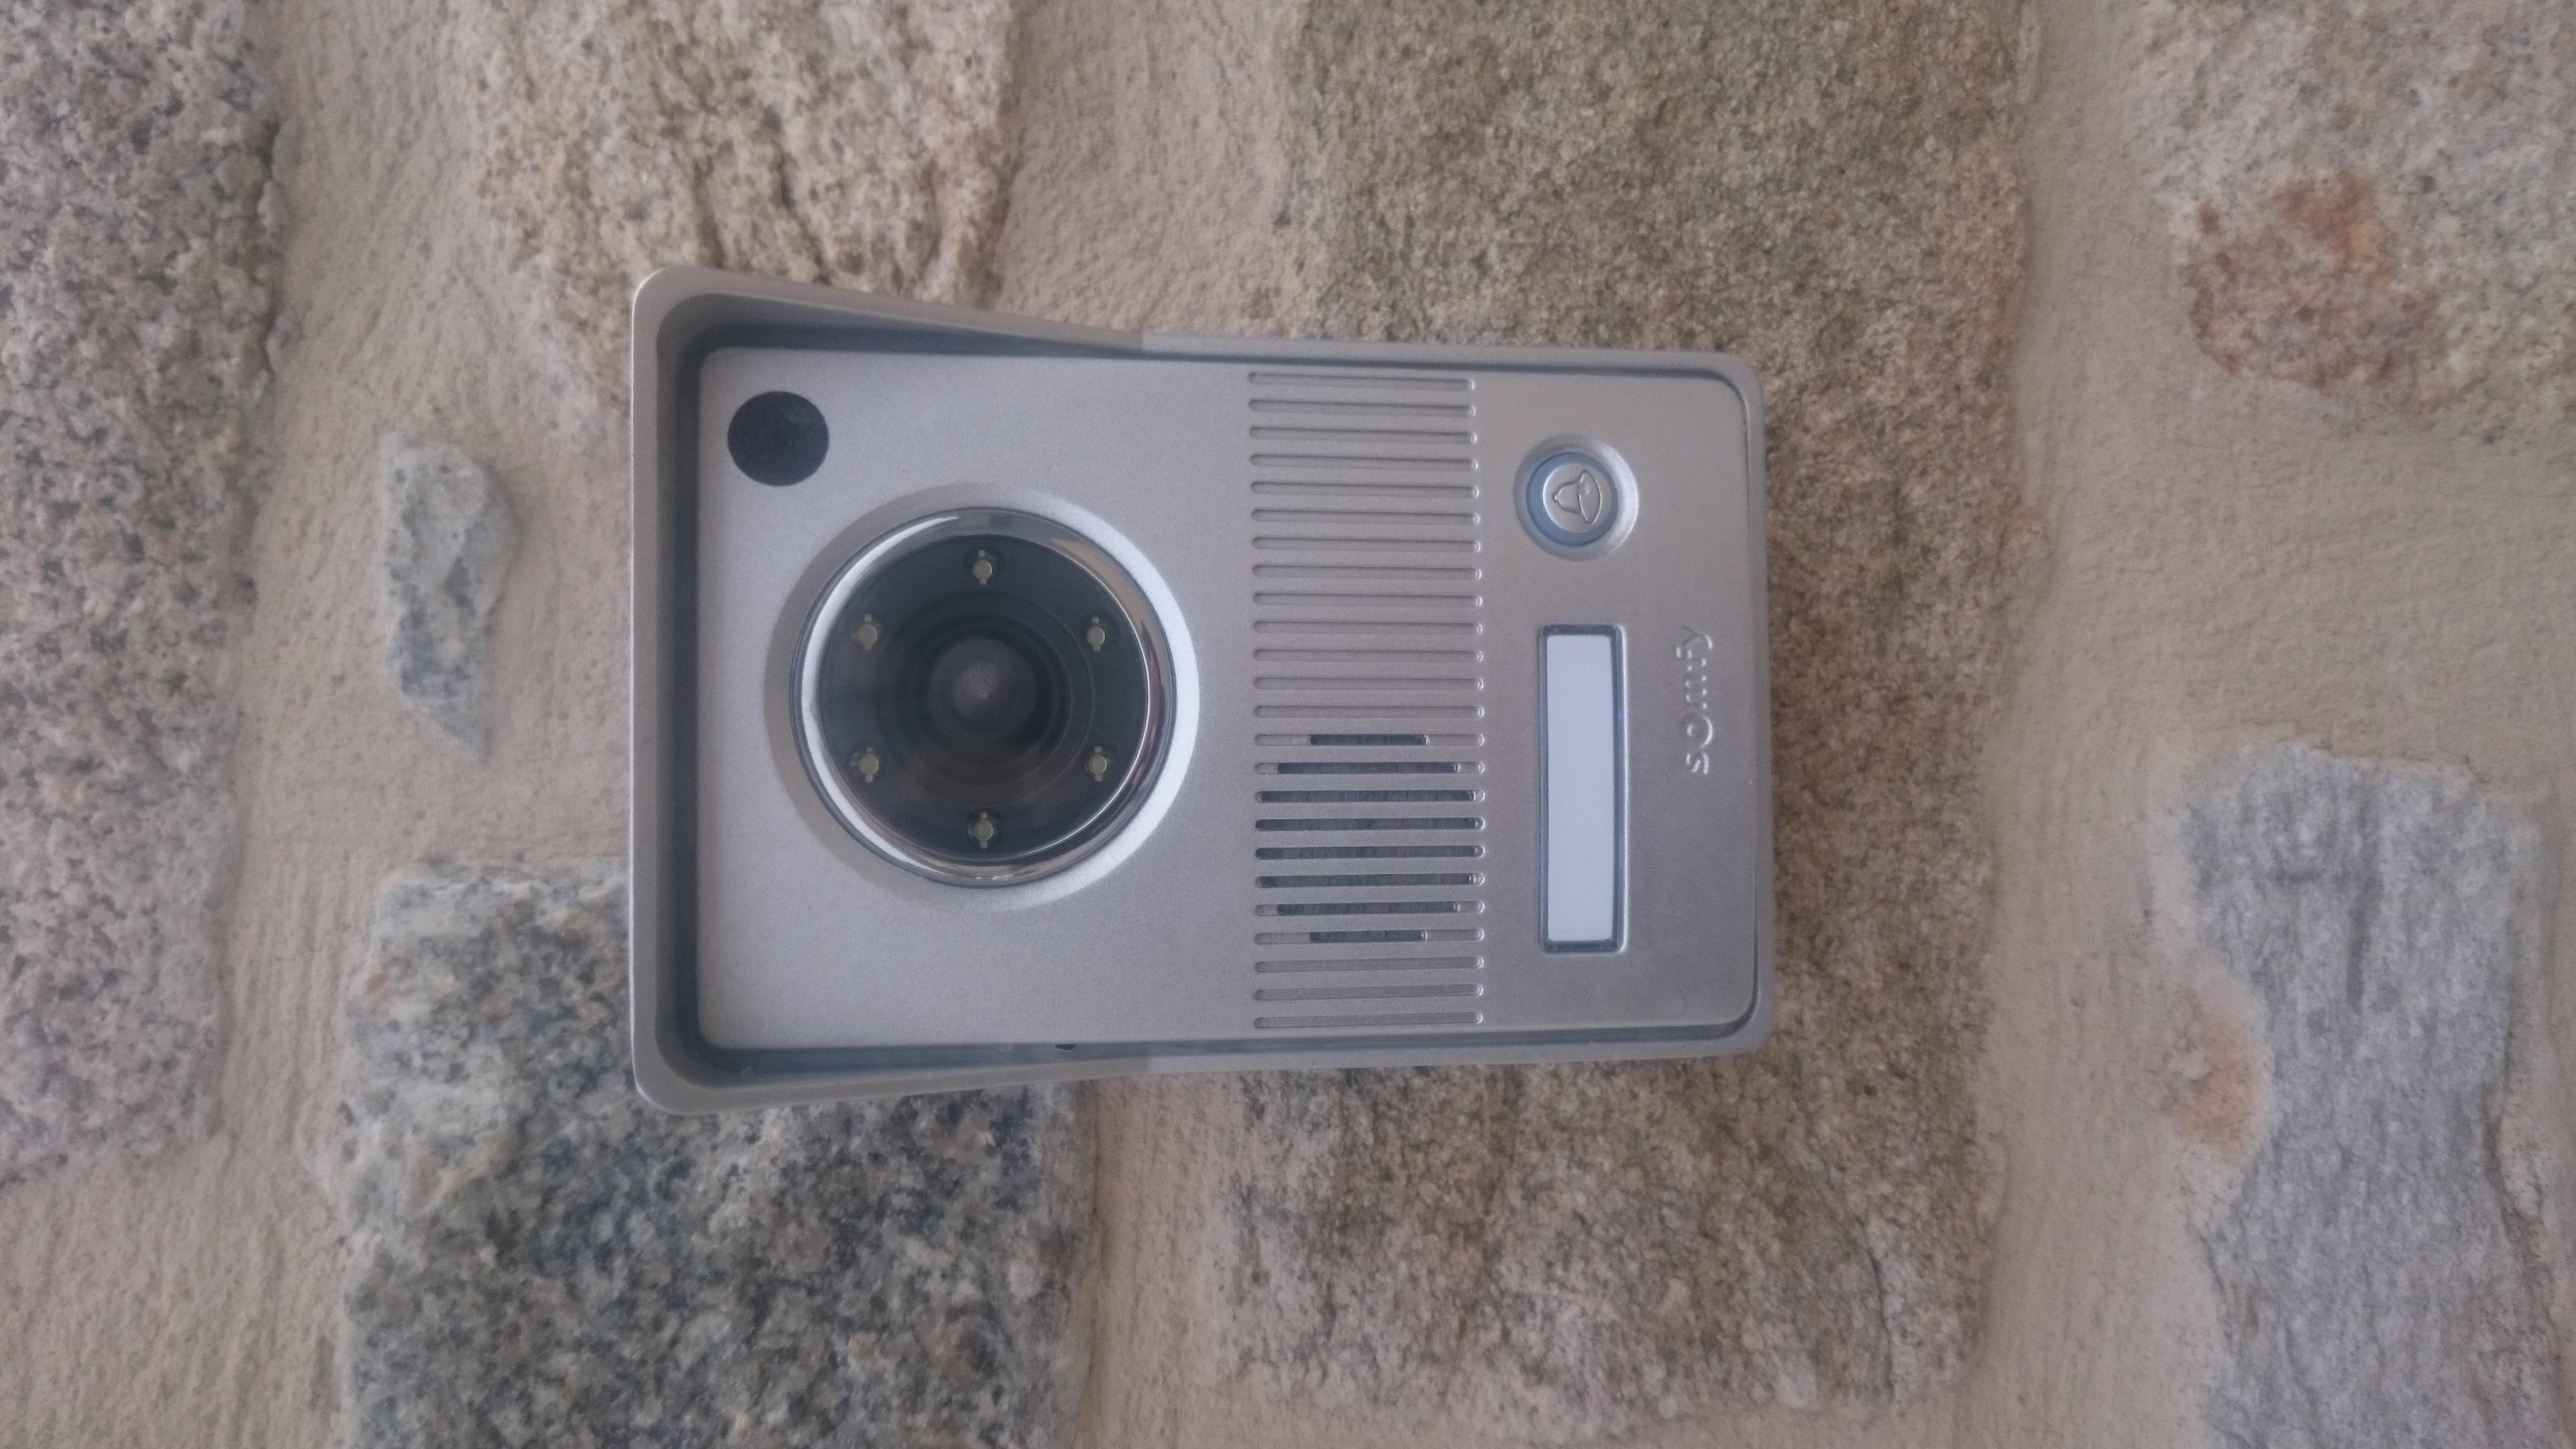 Visiophone v400 humidit interieur avec r ponse s - Visiophone somfy v400 ...